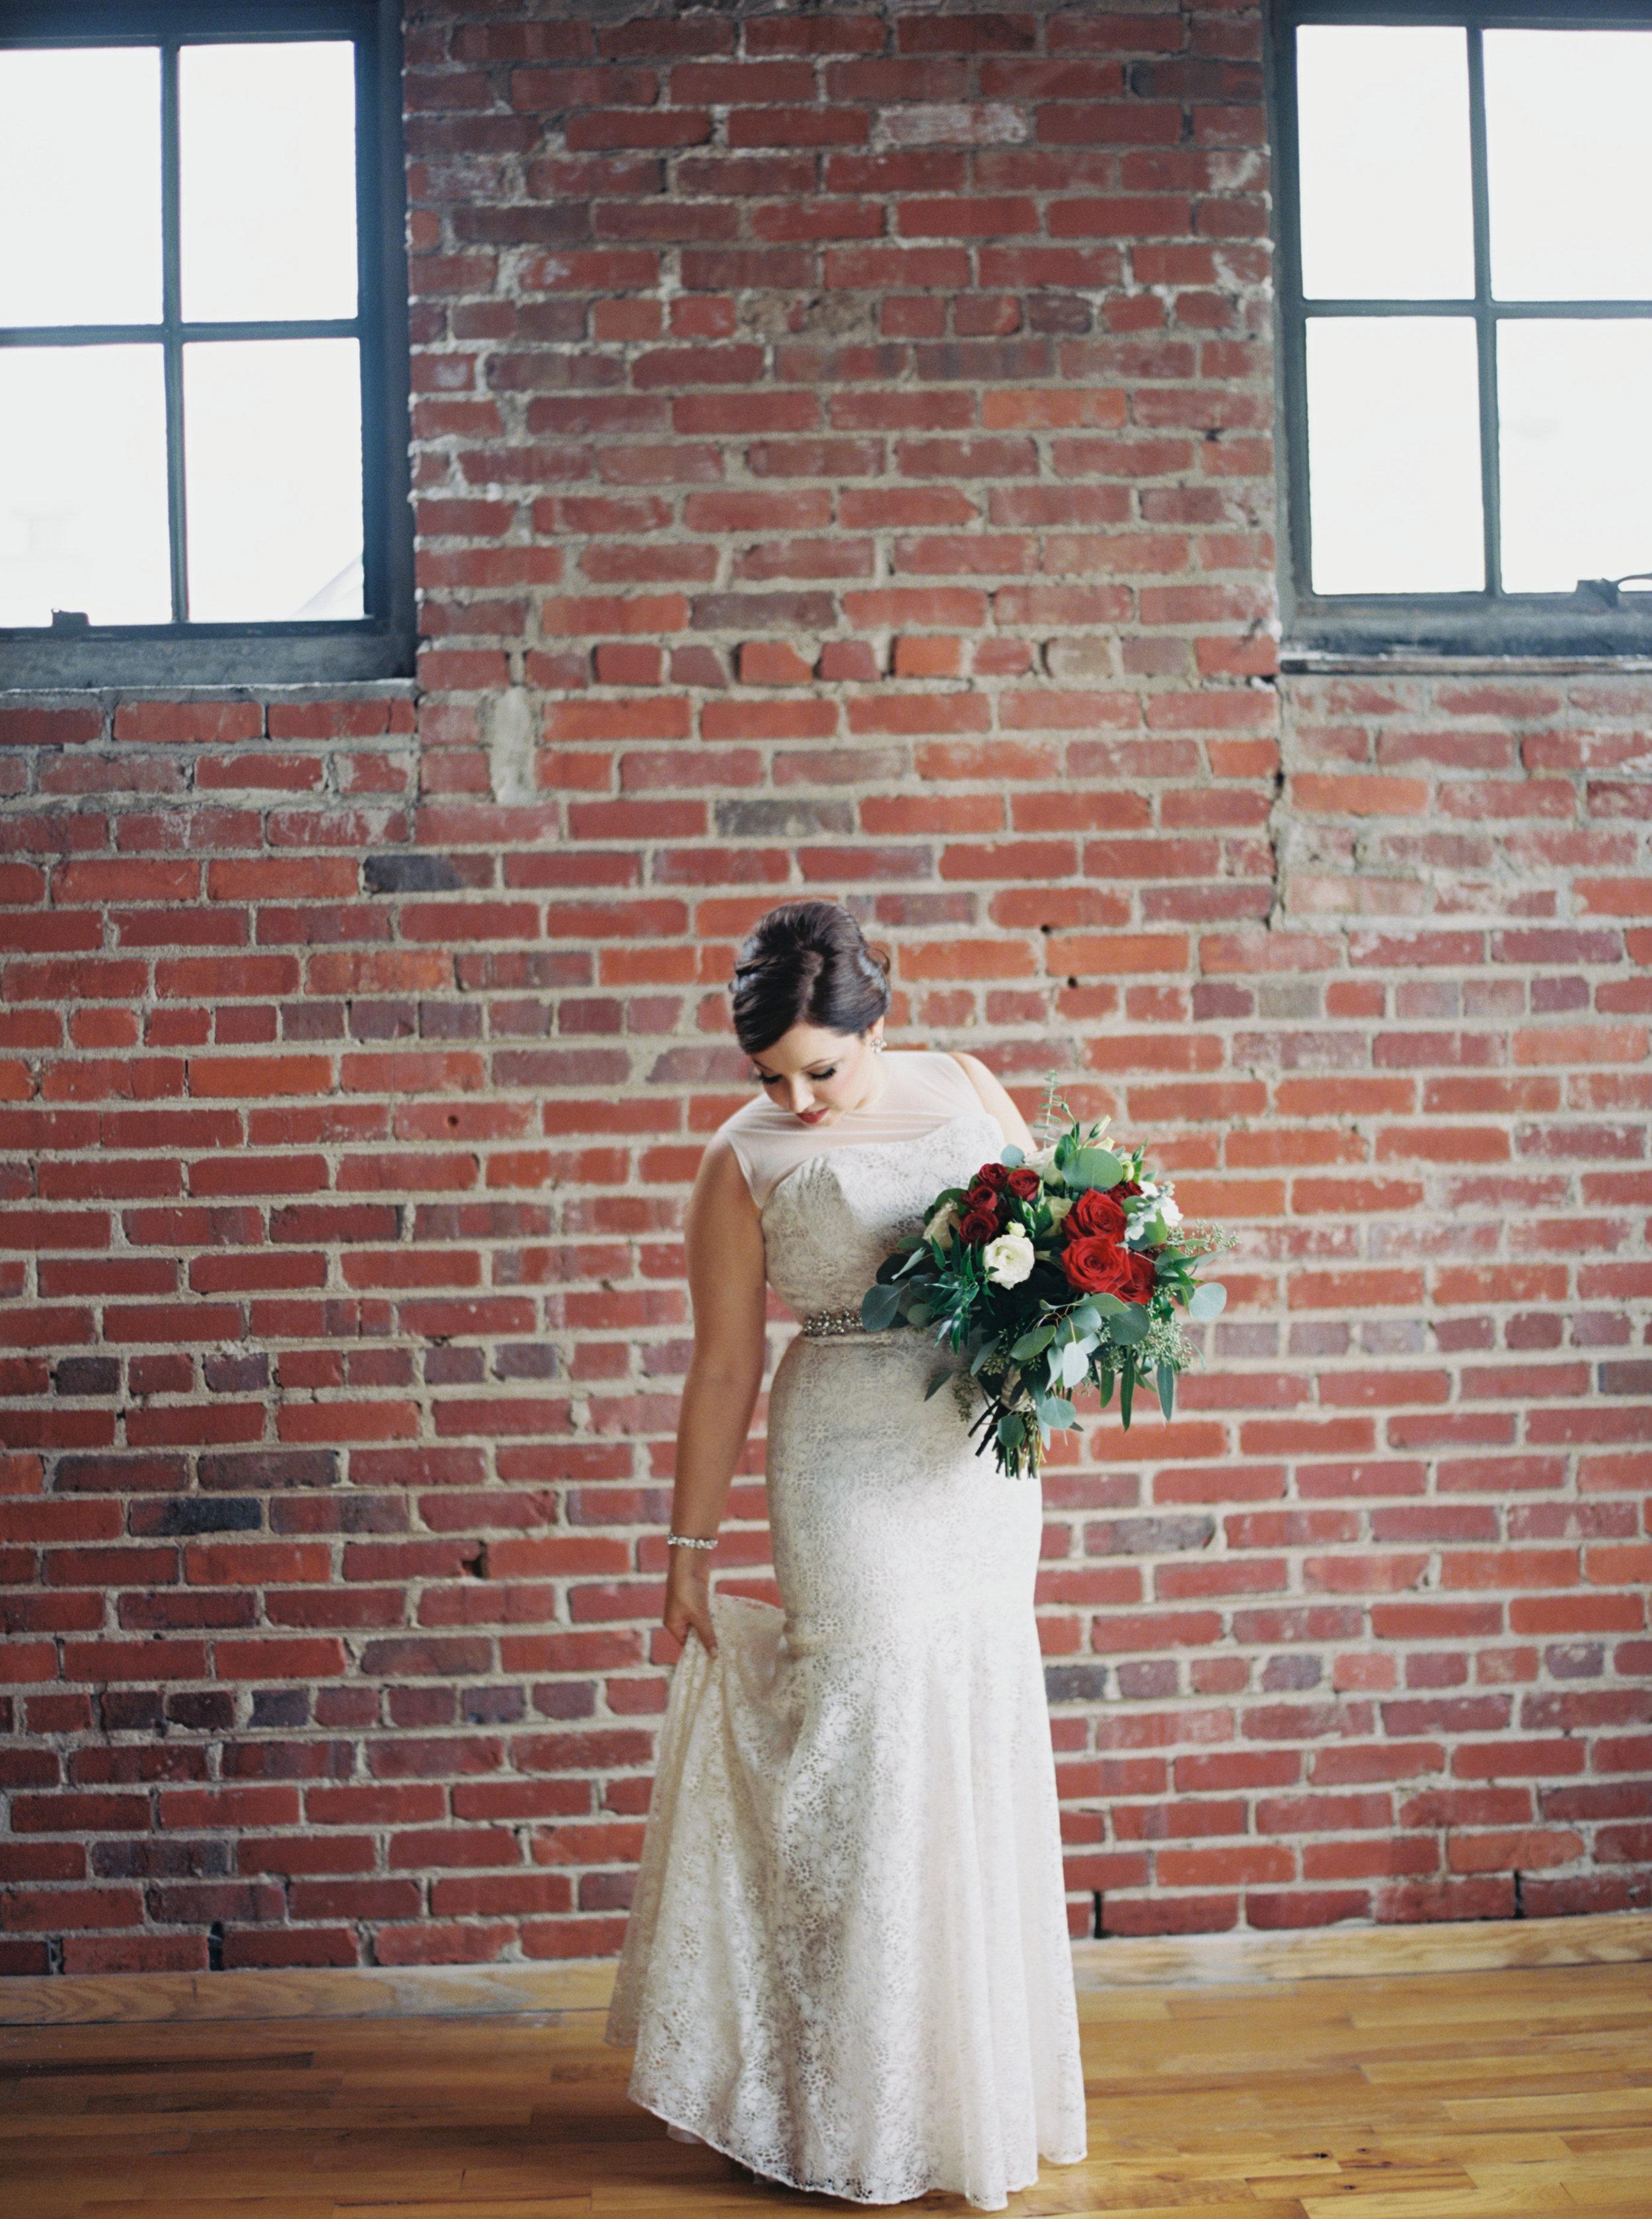 Jessica_Bryan_Wedding_Standard_Knoxville_Abigail_Malone_Photography-161.jpg